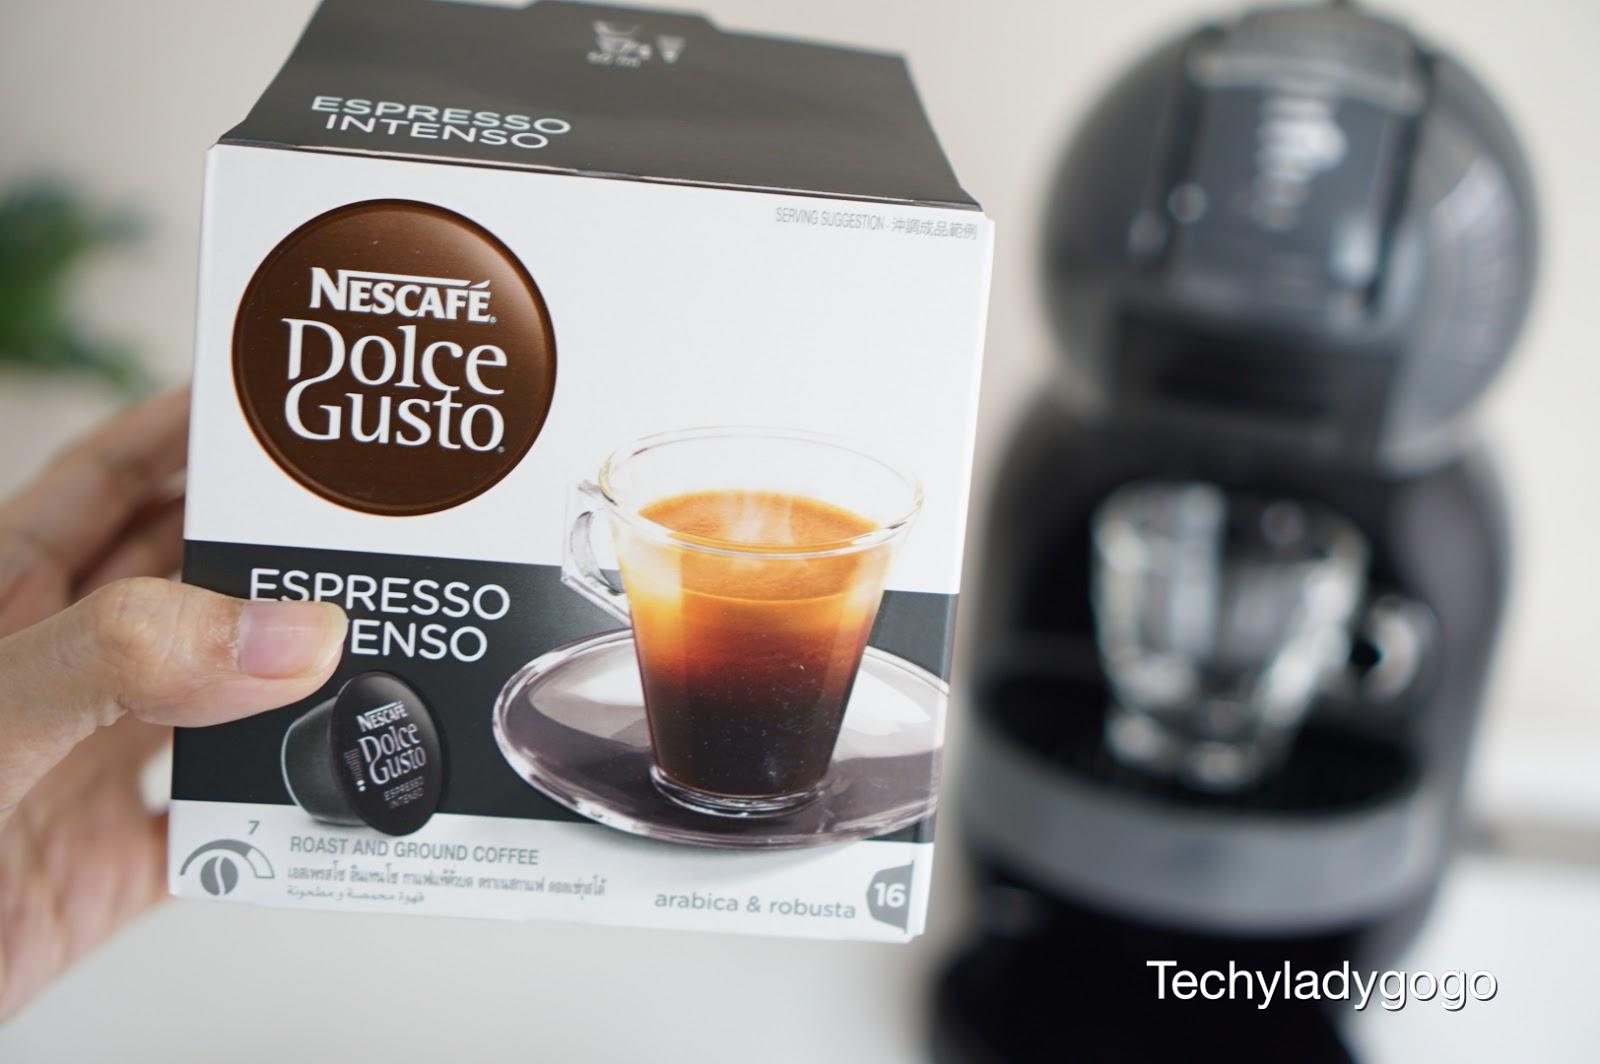 nescafe dolce gusto  ESPRESSO INTENSO เครื่องดื่มกาแฟเข้มข้นจากกาเเฟอาราบิก้าคั่วบดแท้ จะให้รสชาติที่เข้มข้น เหมาะสำหรับผู้ที่ชื่นชอบทานกาแฟรสเข้ม